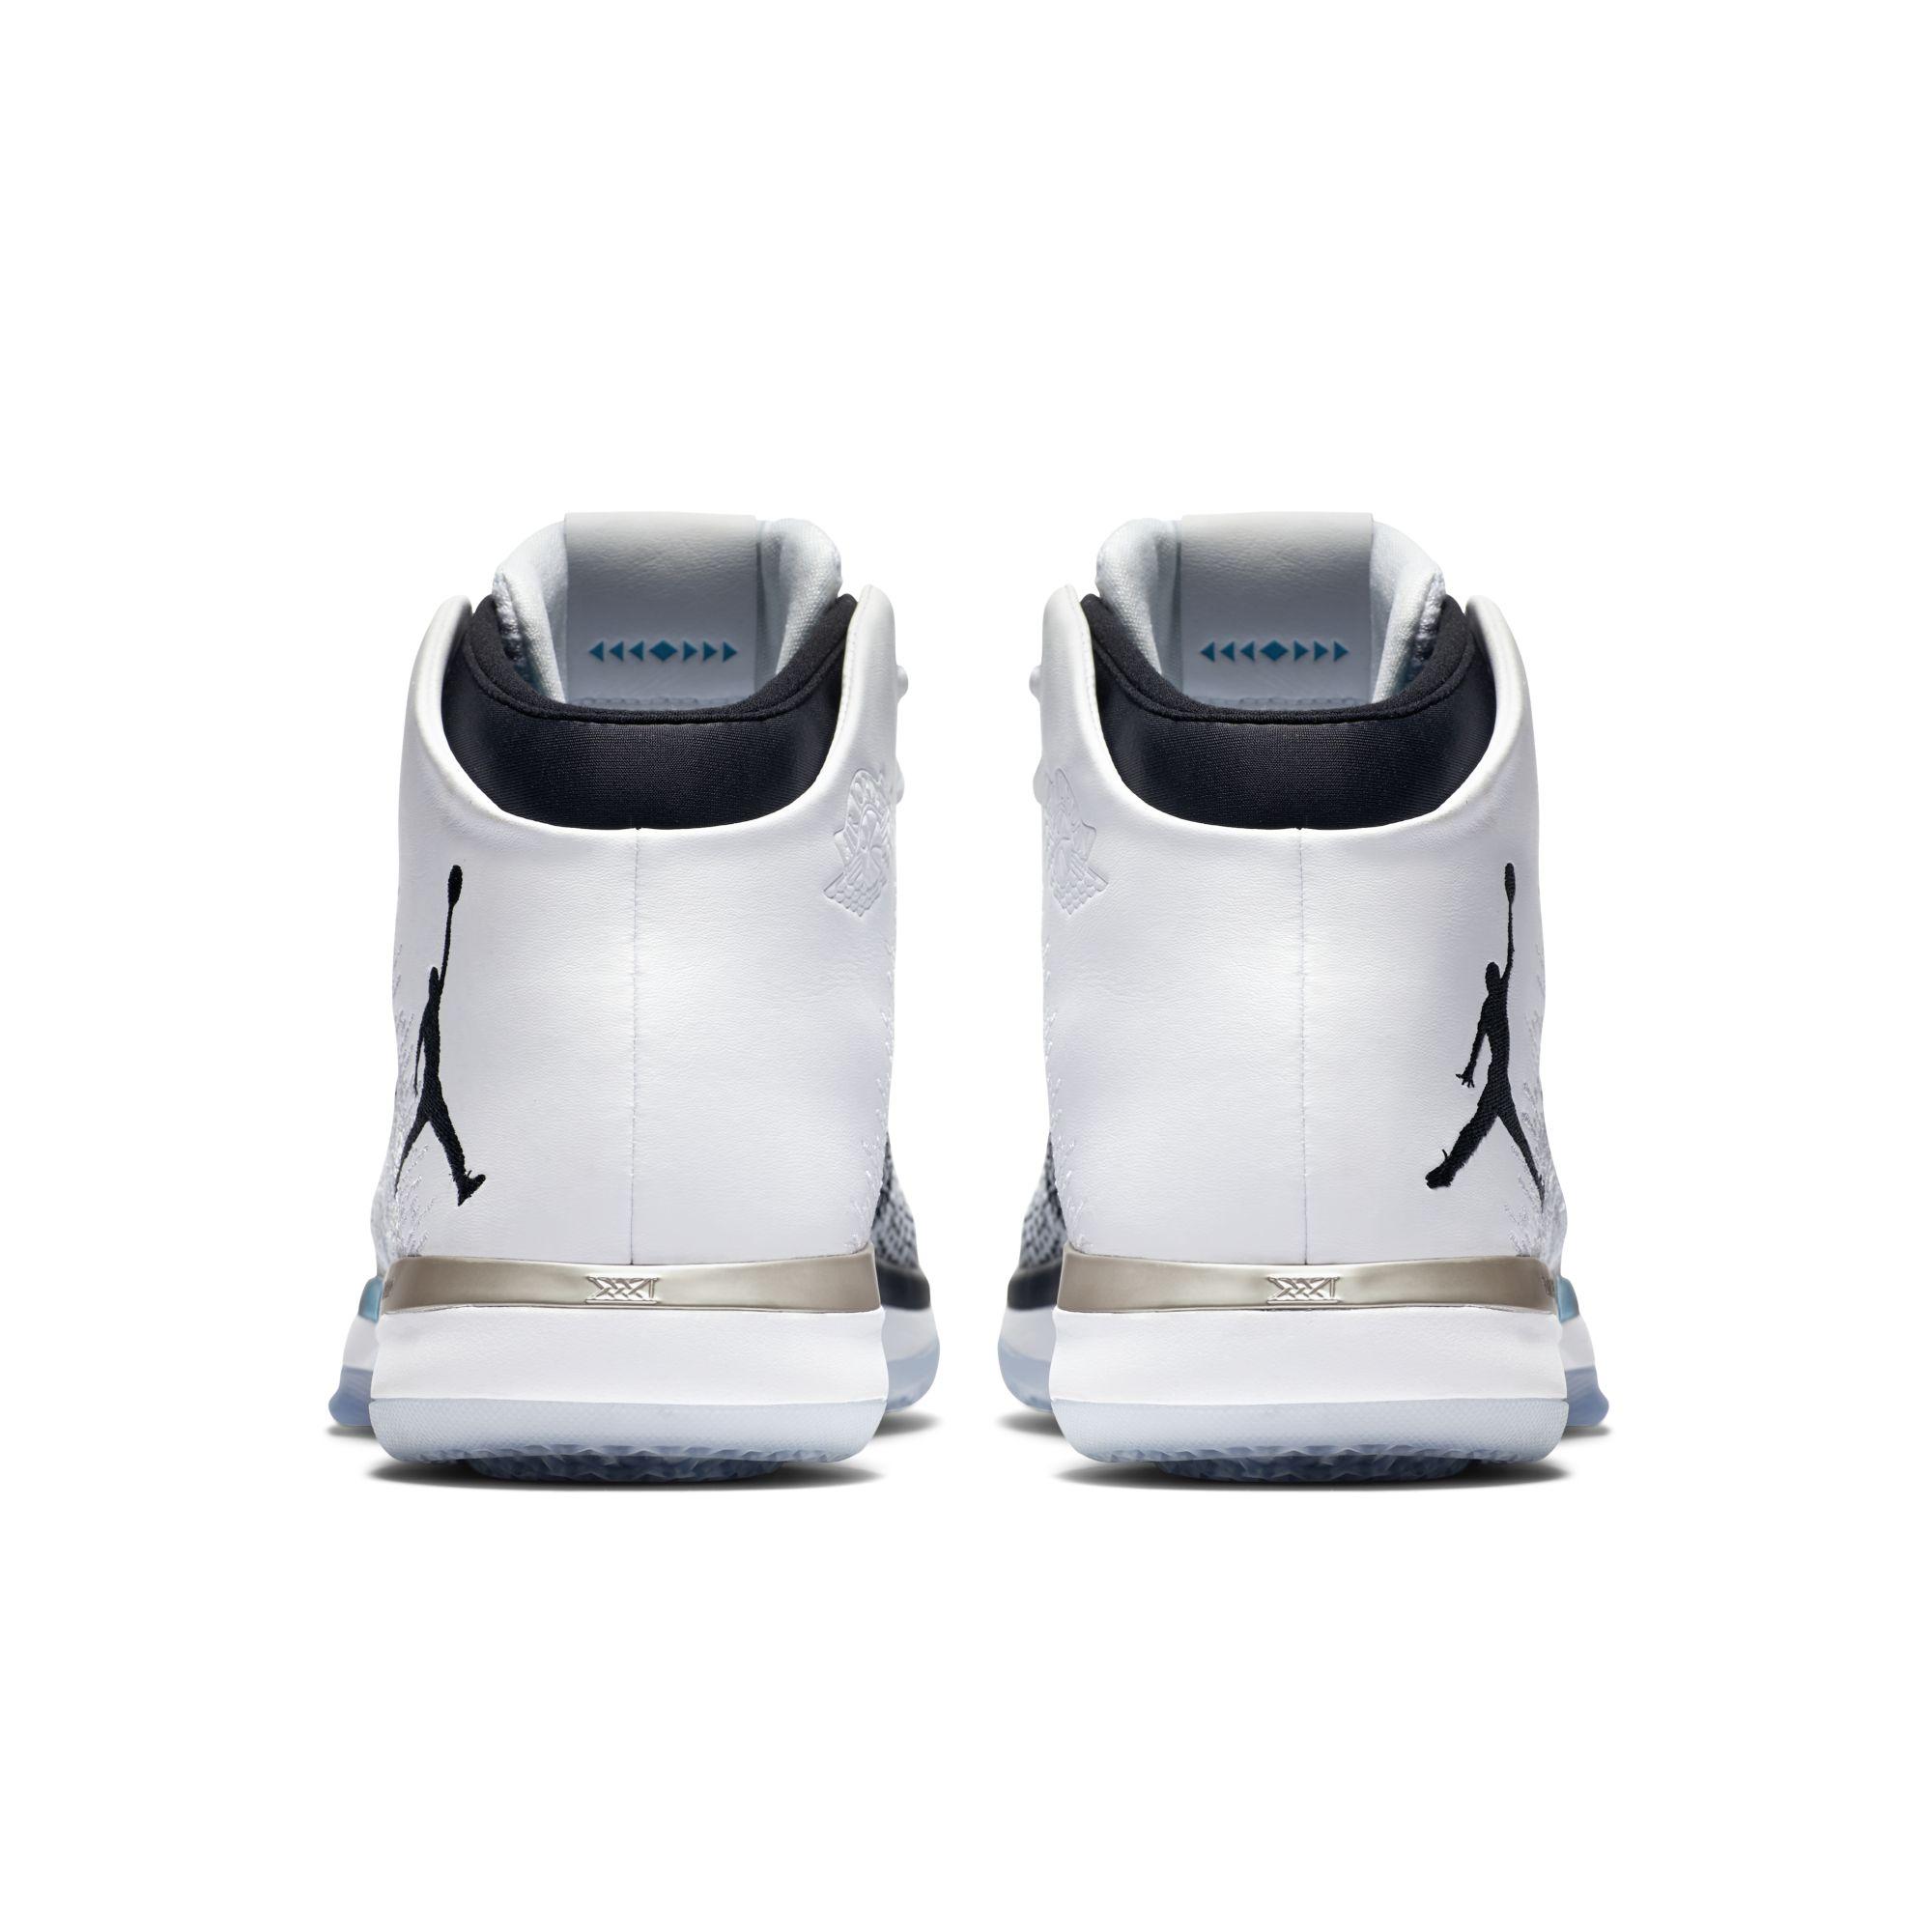 JordanXXXI-N7-Heel